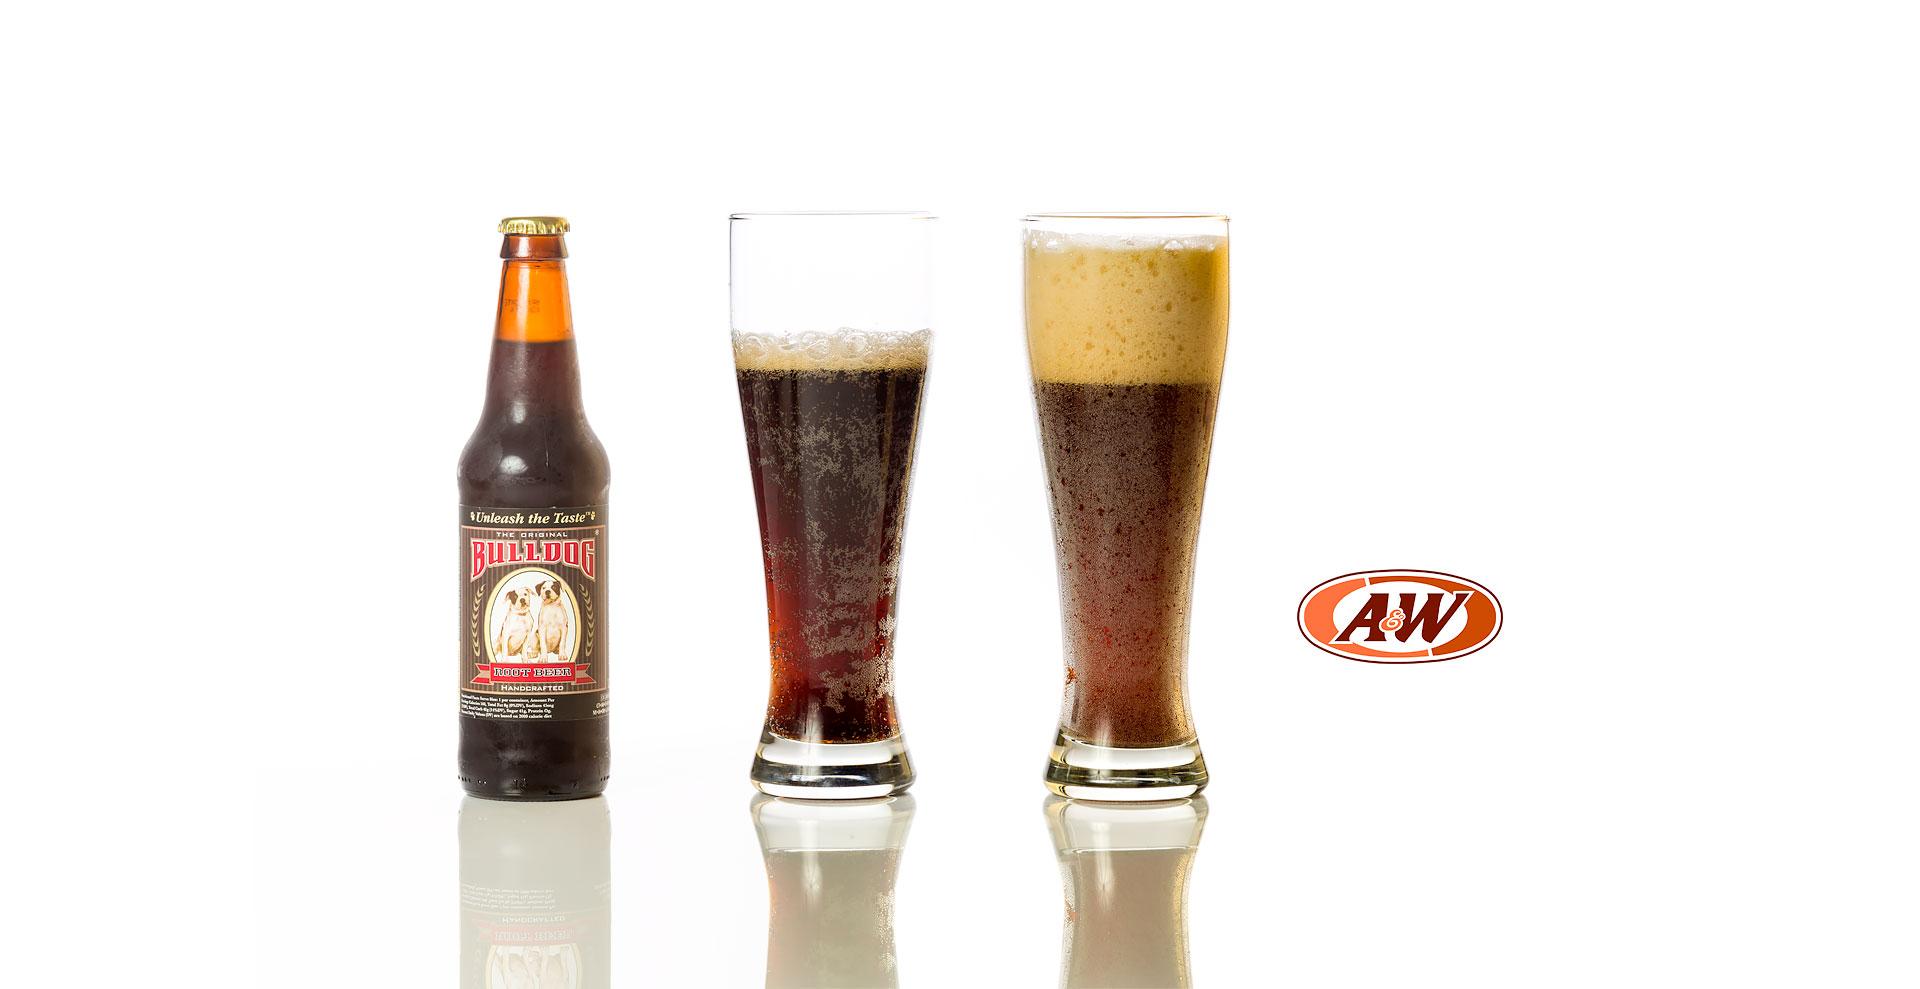 Bulldog vs A&W Root beer